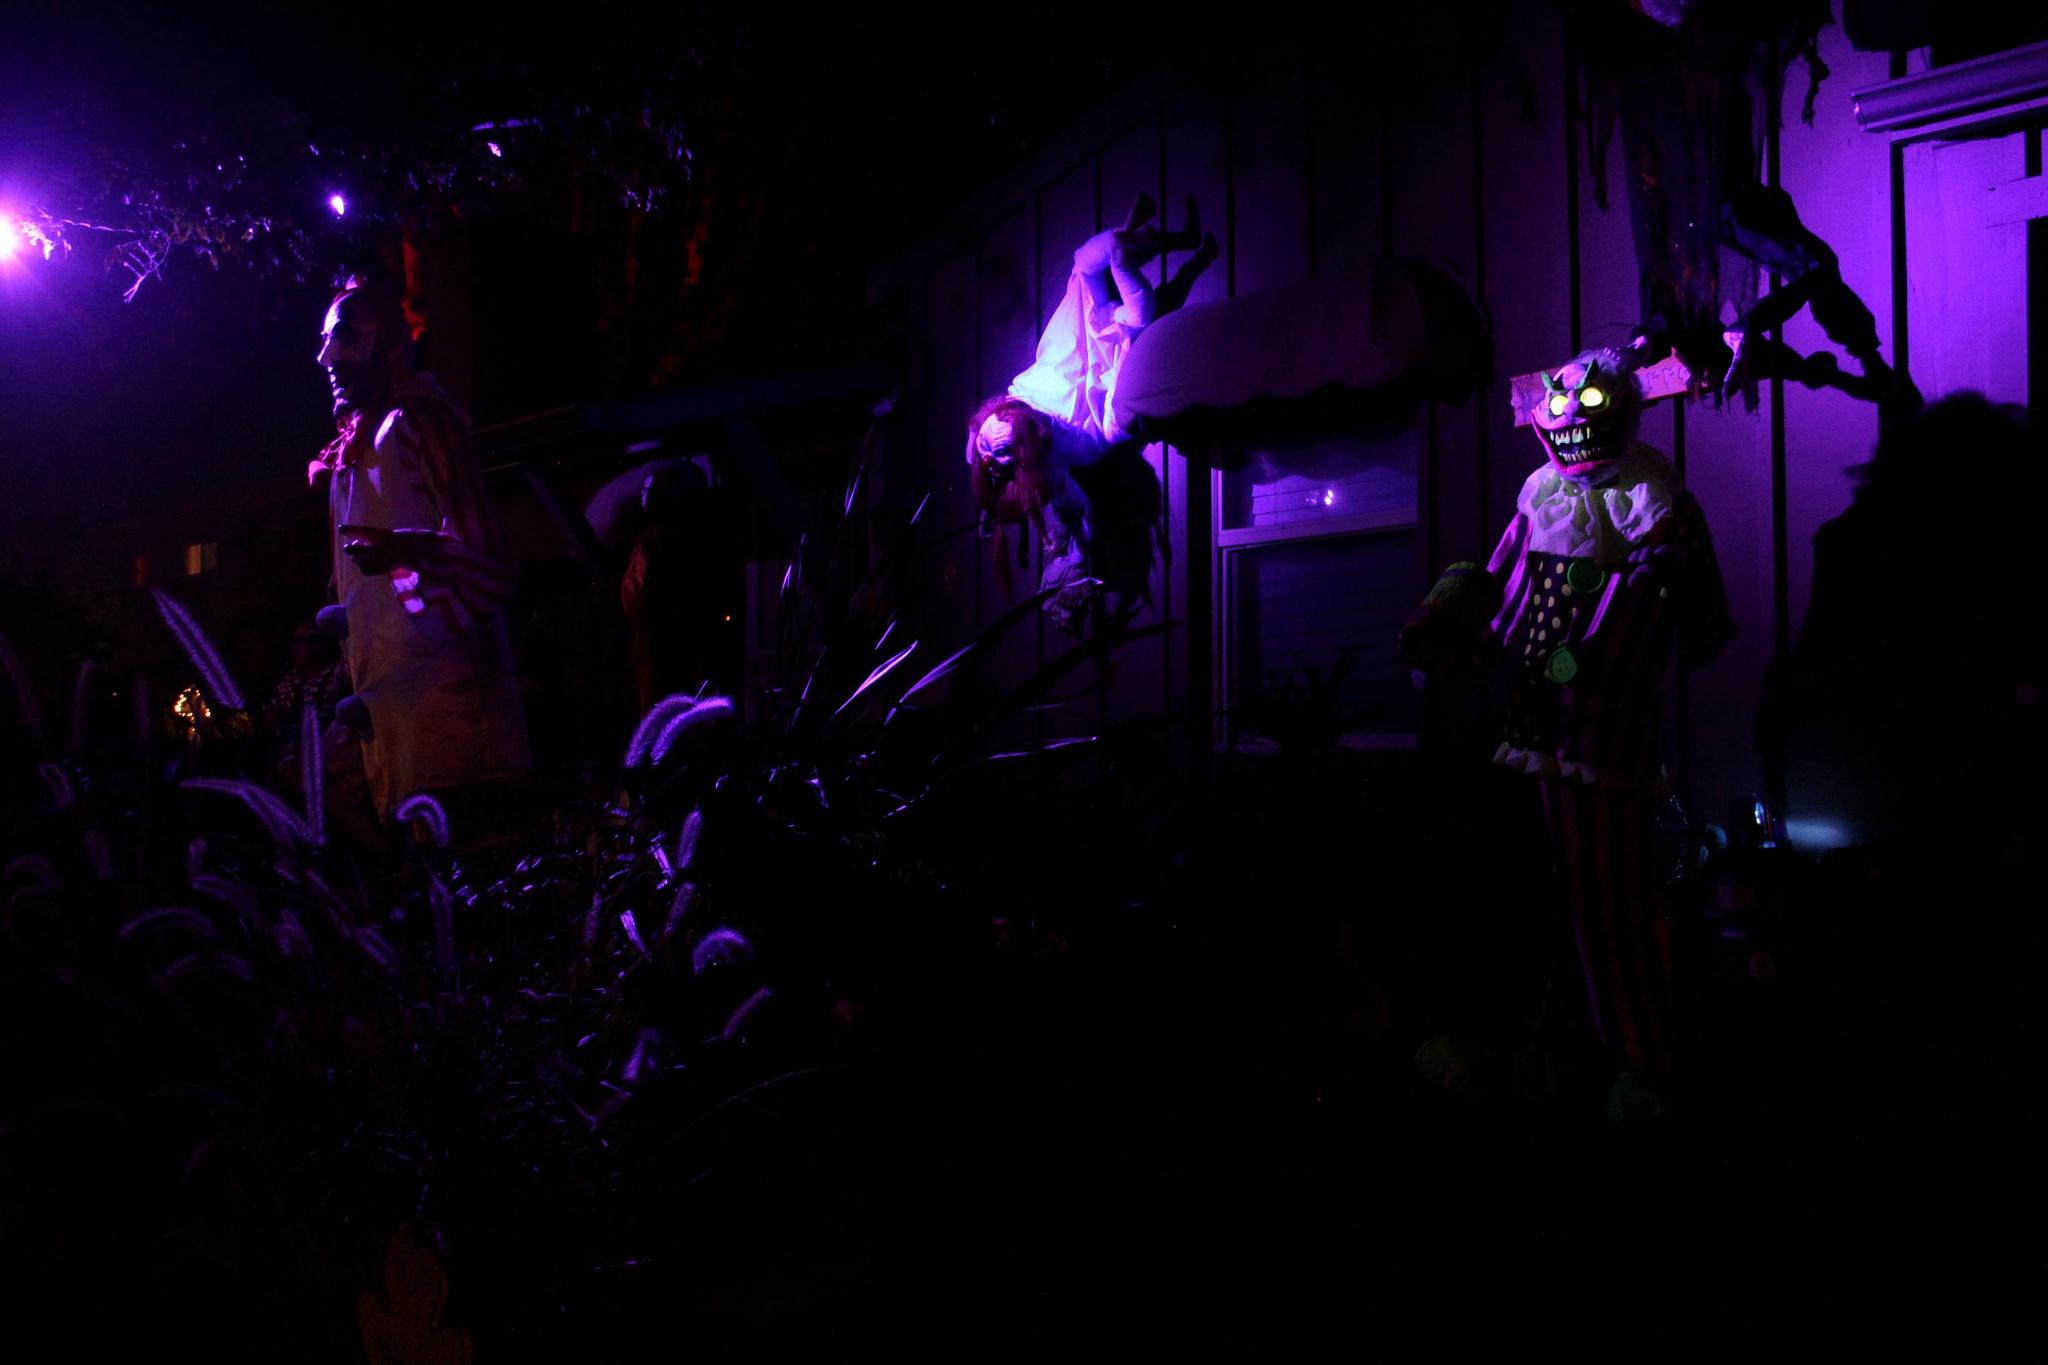 Halloween Corner 4 by Francisco J Chavira